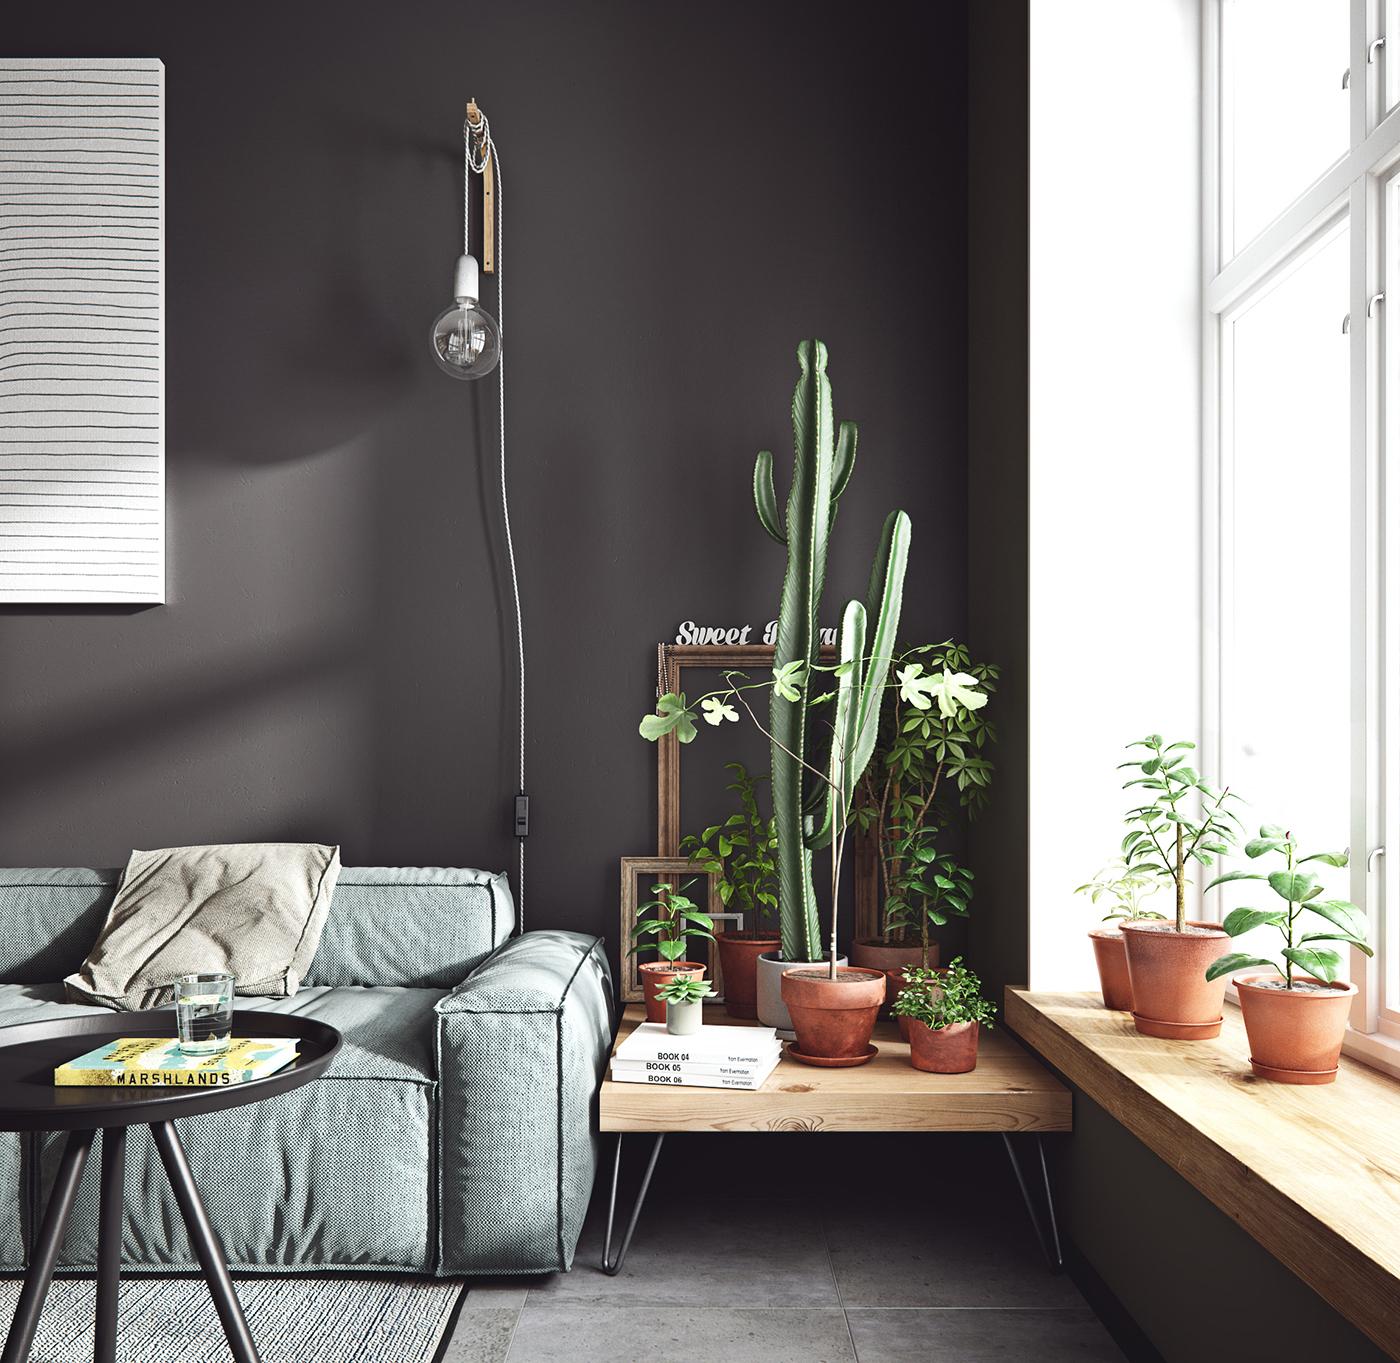 zithoek-woonkamer-cactus